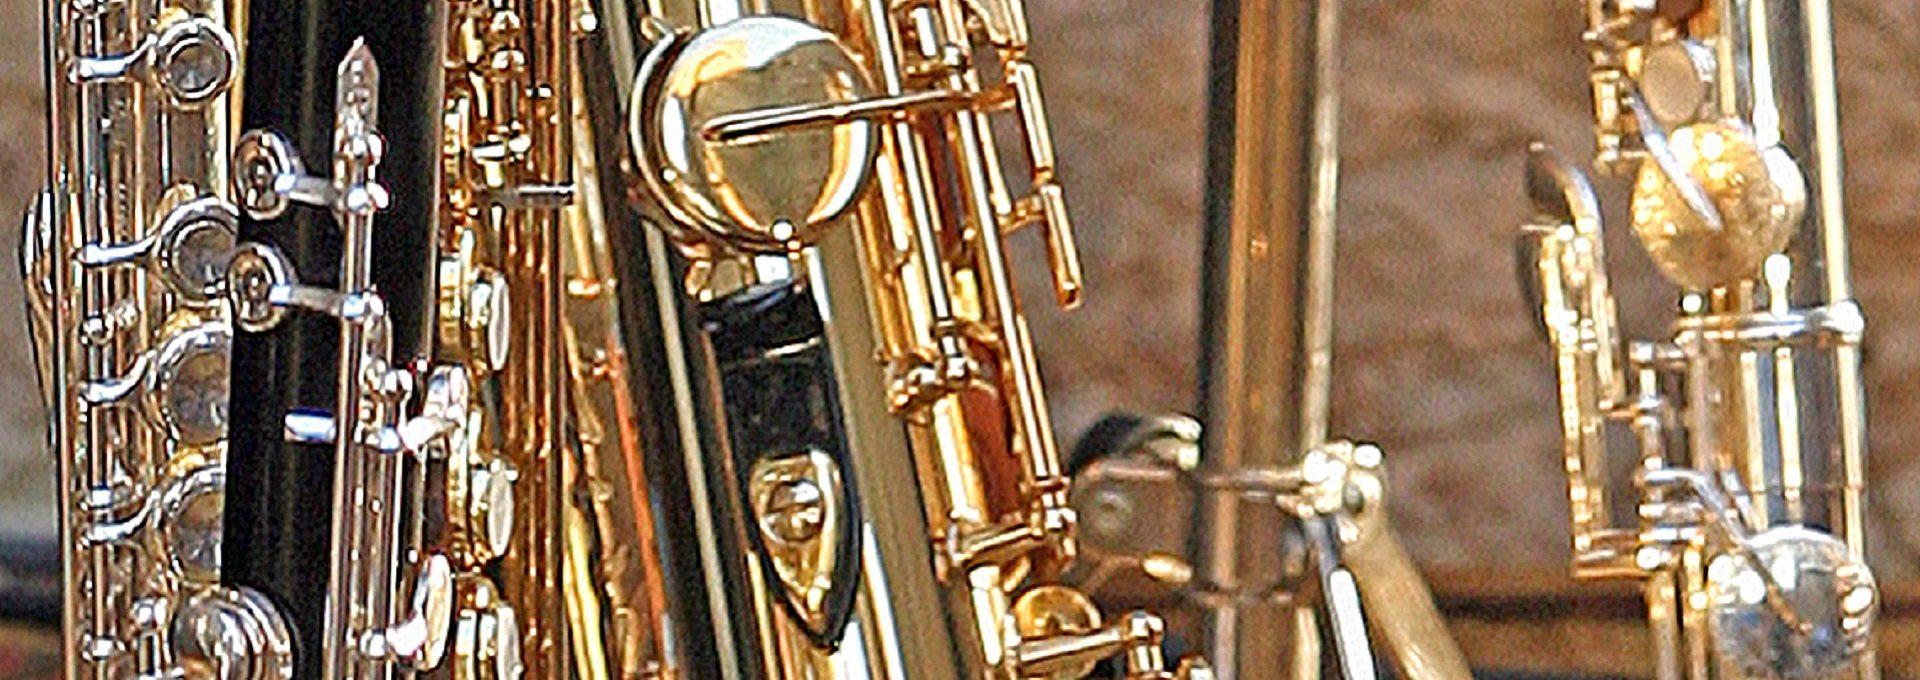 Aufnahme Saxophone